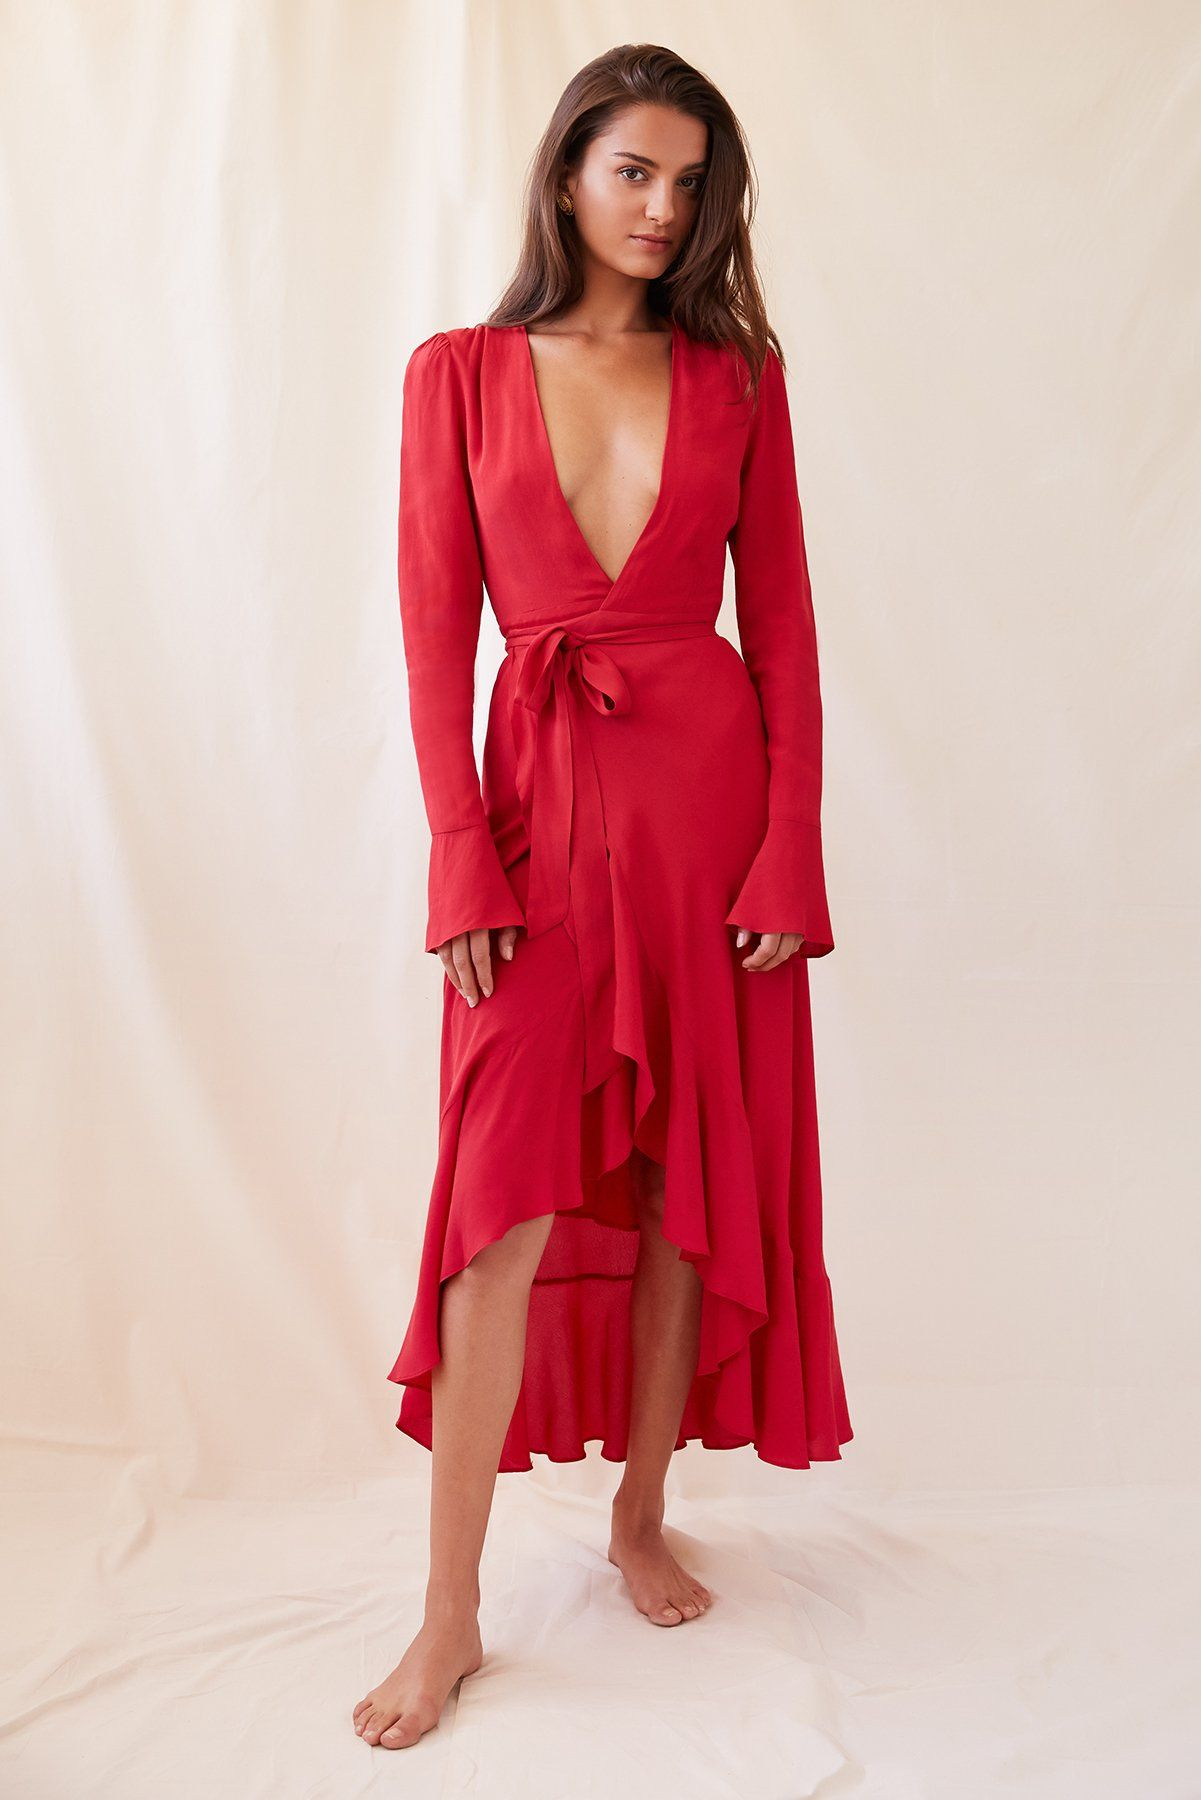 9eaf761cb0 Chloé Dress in Red | CLoThEs | Chloe dress, Dresses, Wrap dress